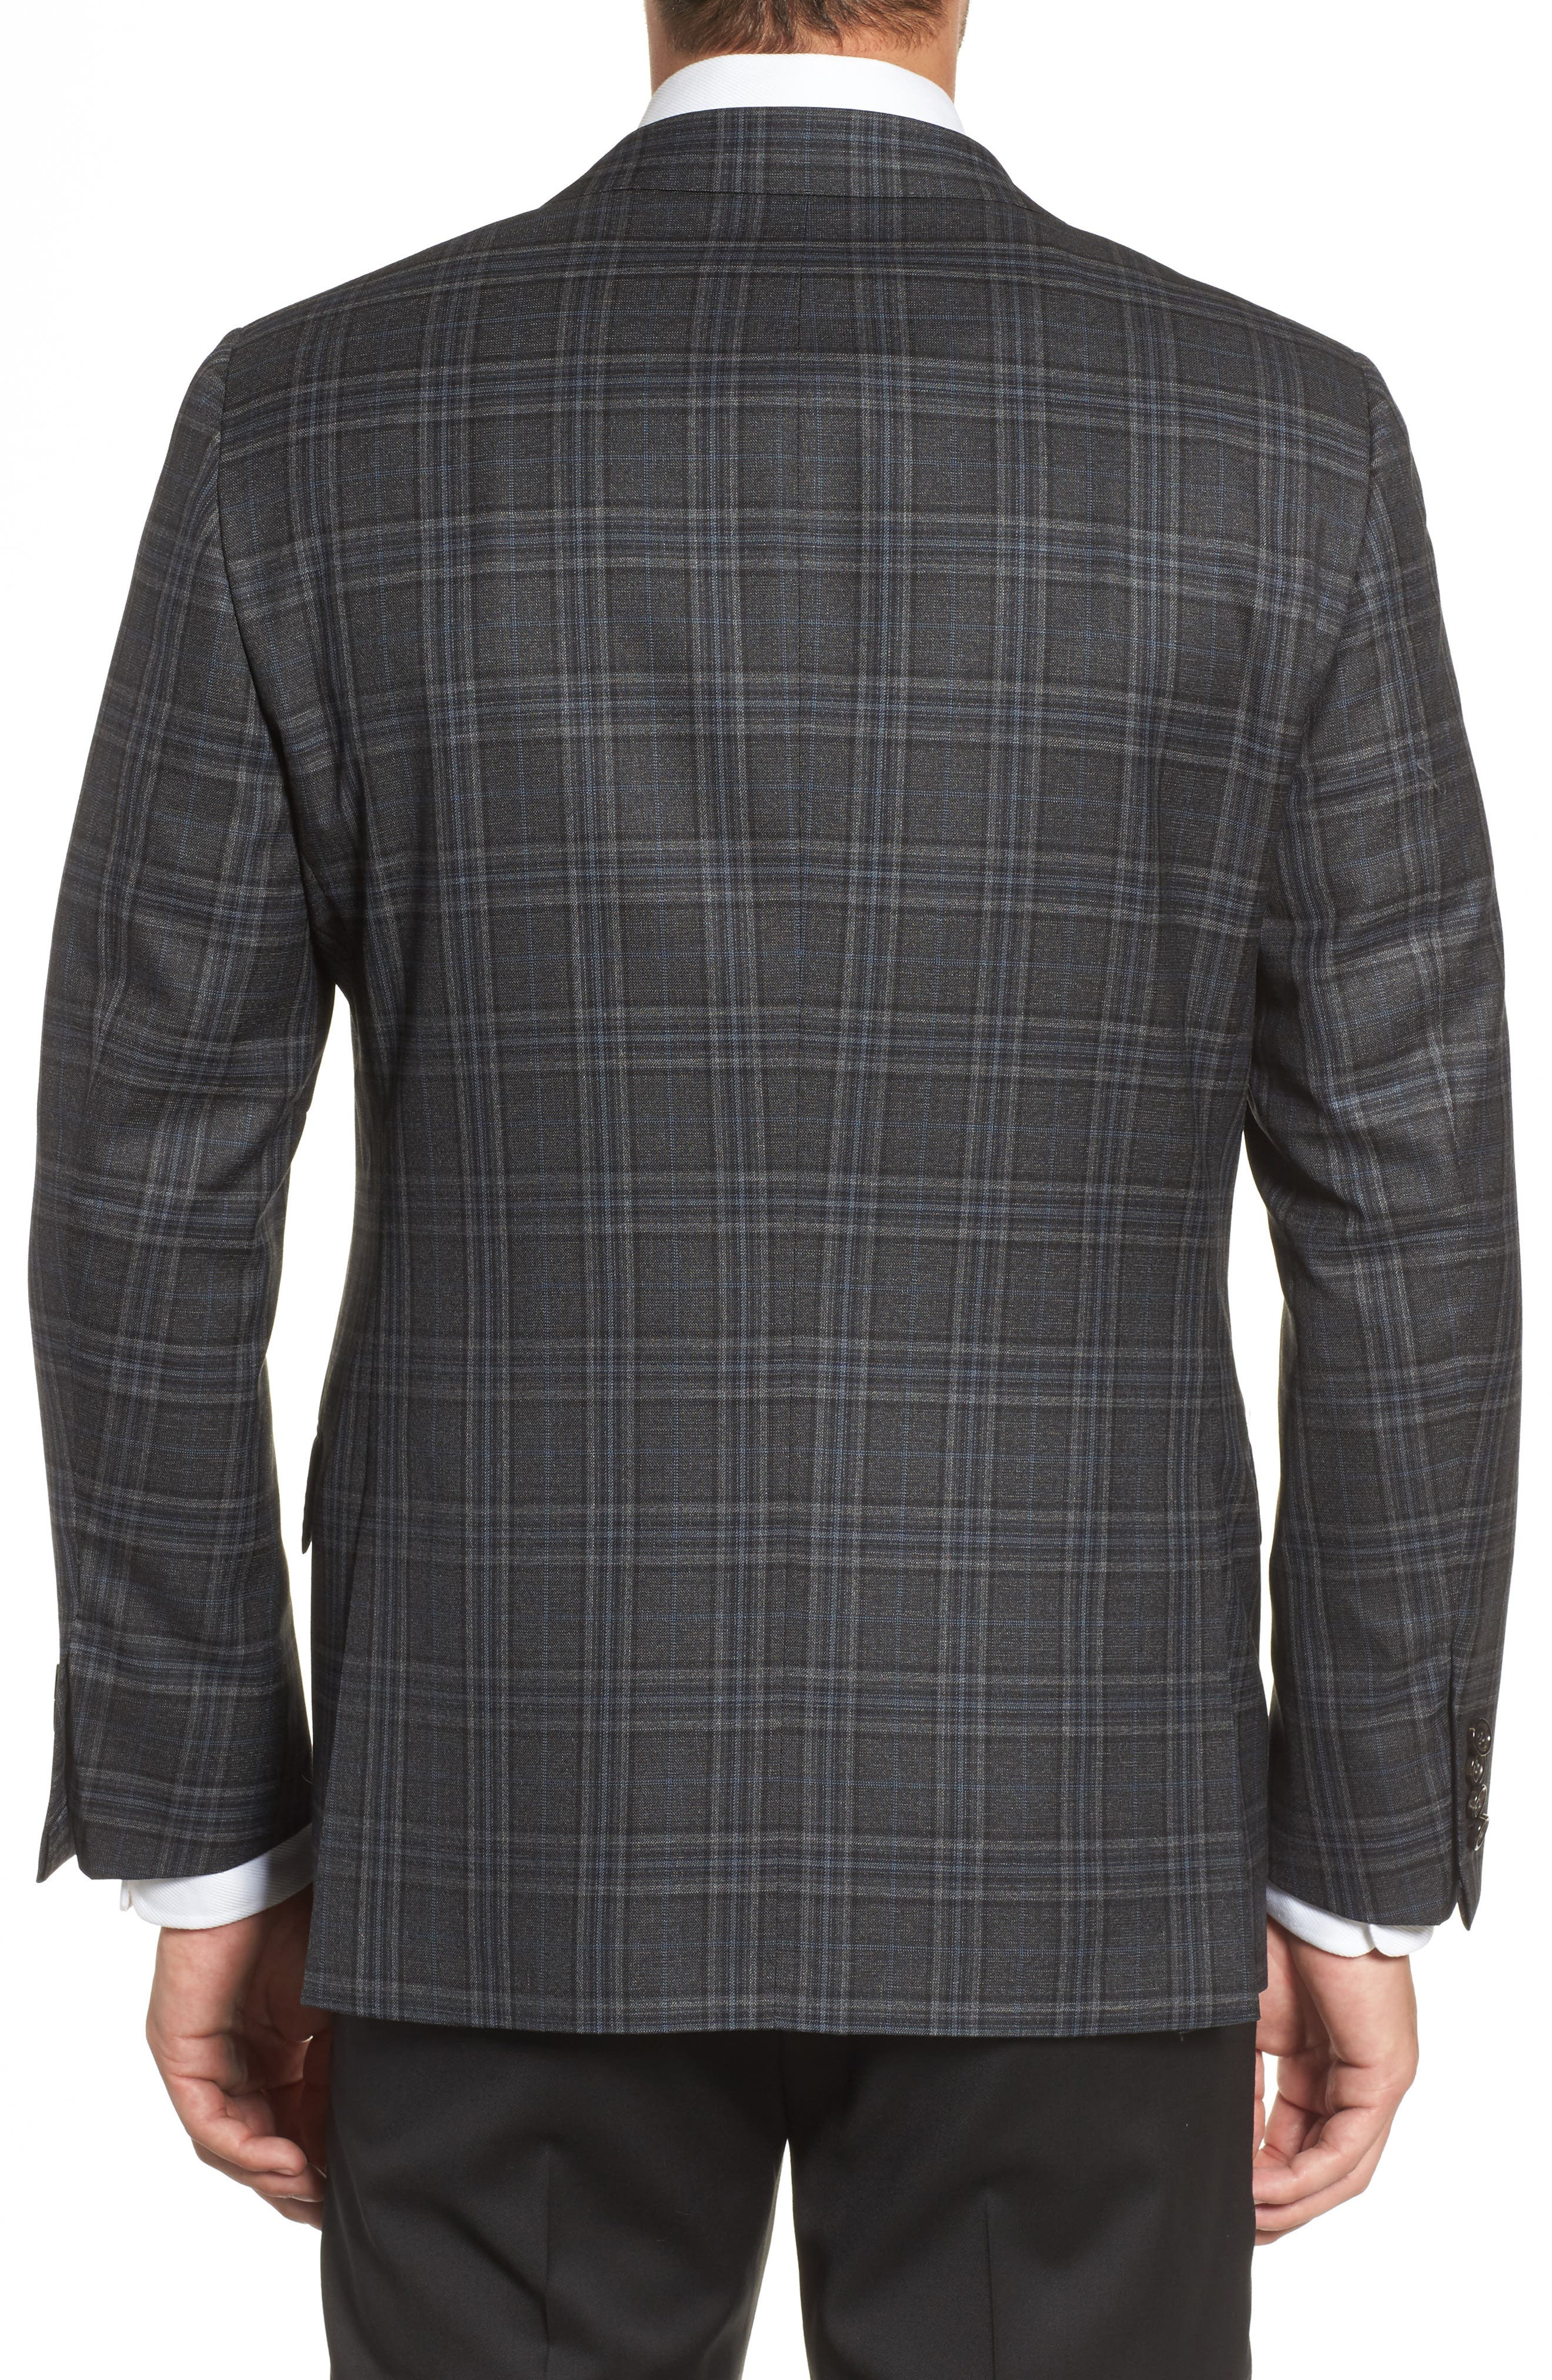 Alternate Image 2  - Hickey Freeman Classic B Fit Plaid Wool Sport Coat